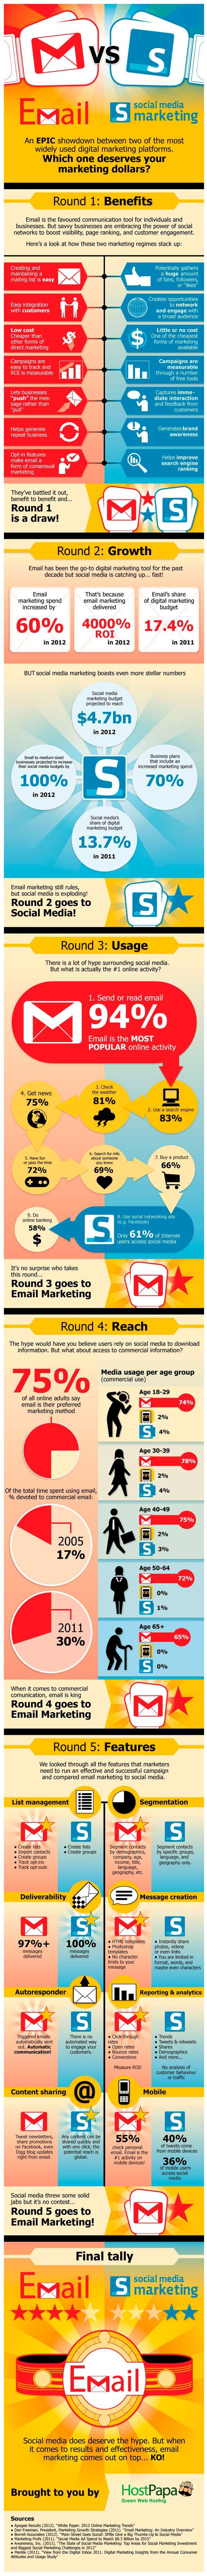 Email Marketing contra Social Media Marketing. #infografia